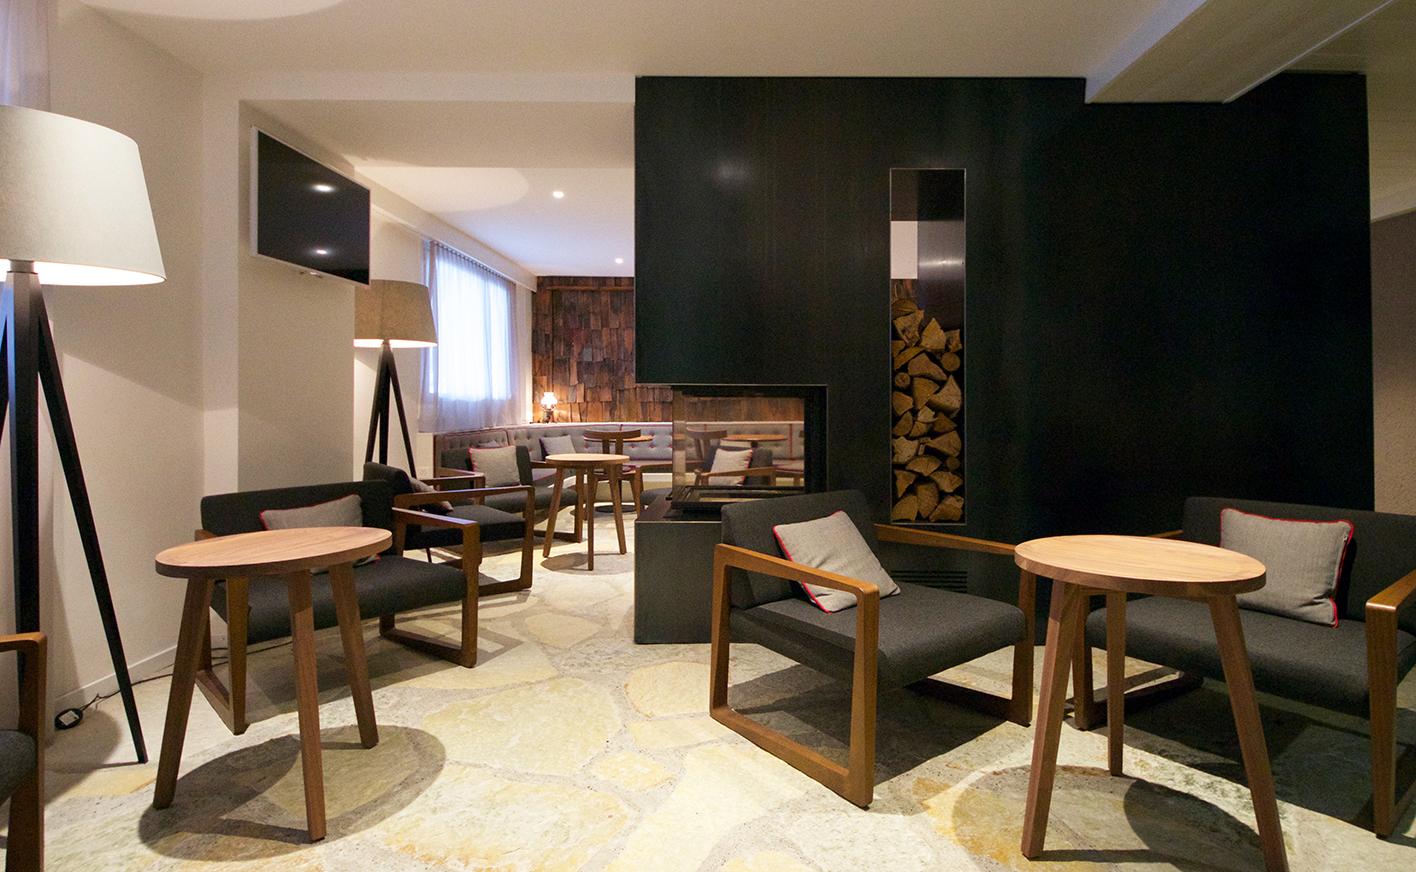 Innenarchitektur Bern umbau lobby seminarräume hotel valaisia crans montana atelier